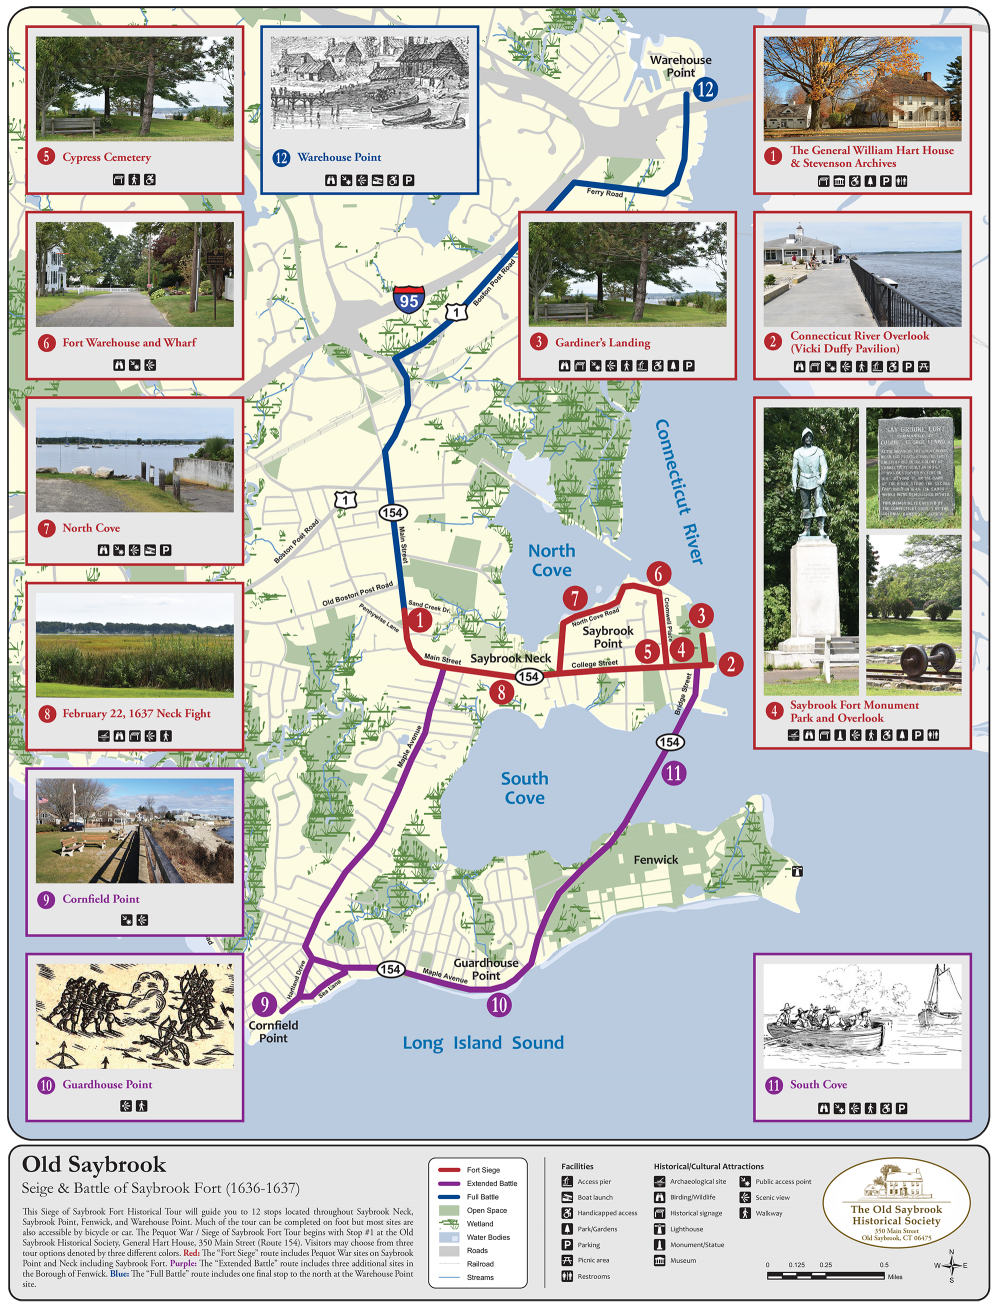 Seige & Battle of Saybrook Fort Map